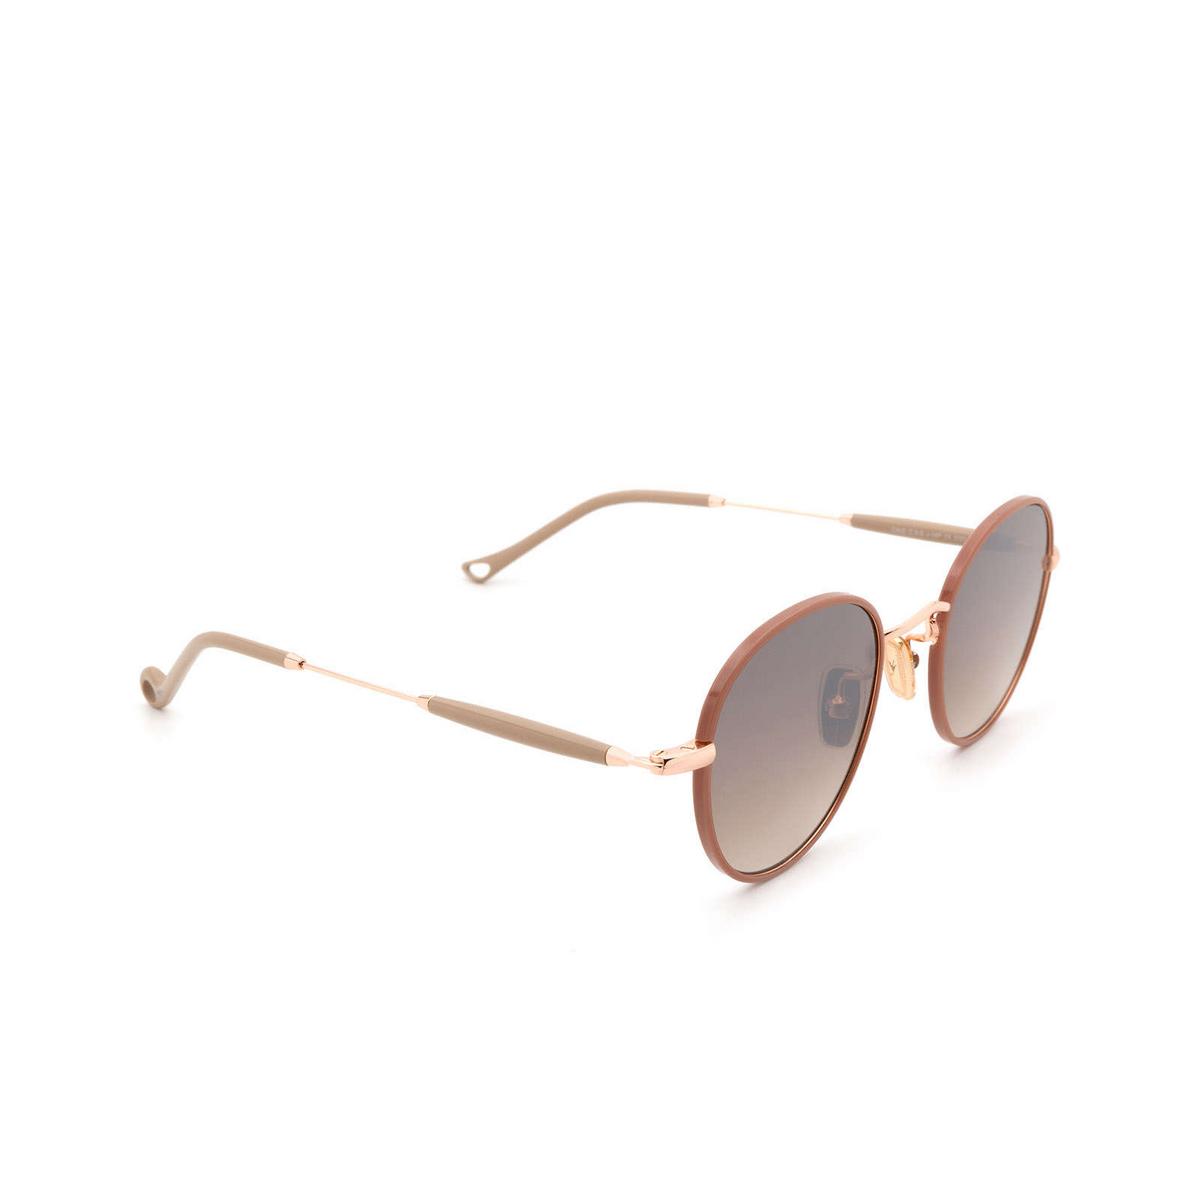 Eyepetizer® Round Sunglasses: Cinq color Pinkish Brown C.9-E-J-18F - three-quarters view.